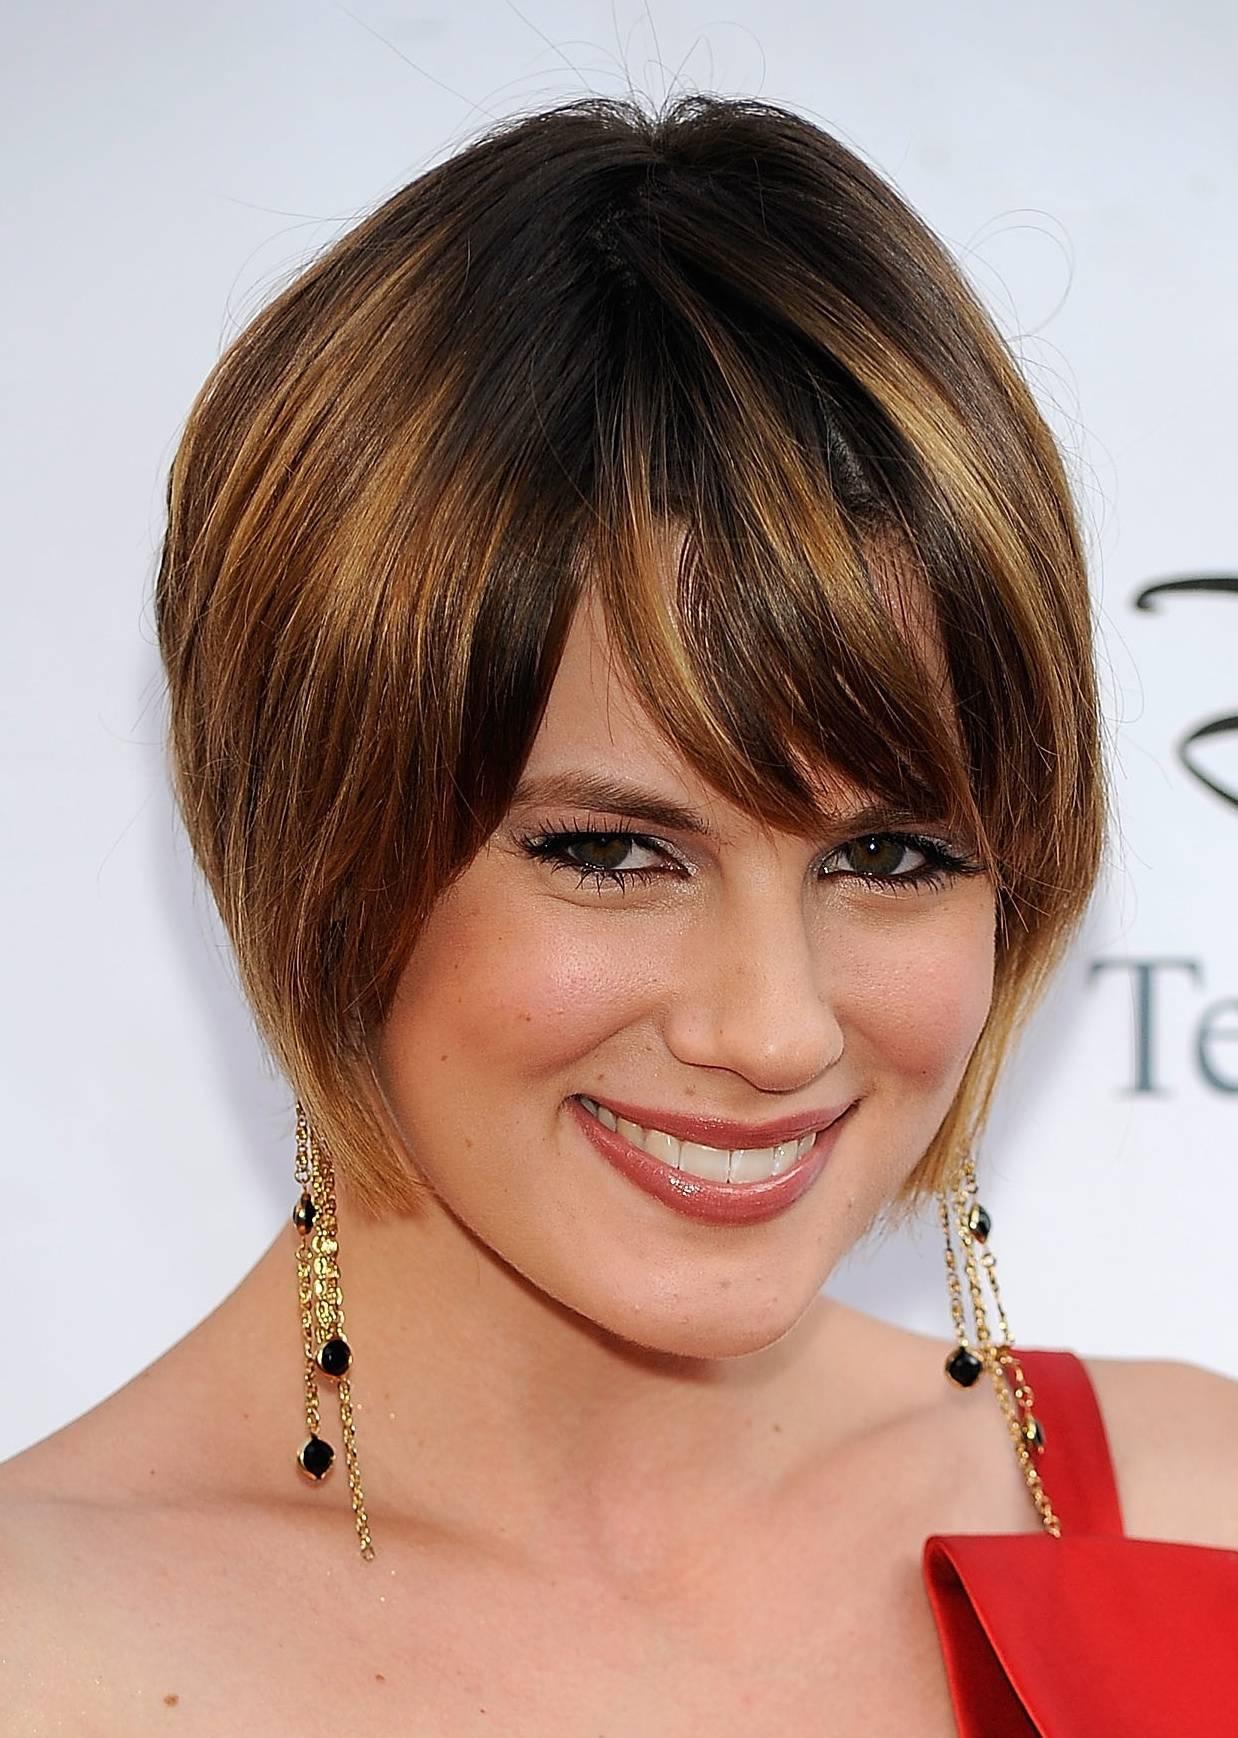 Sensational 23 Cute Short Hairstyles With Bangs Styles Weekly Short Hairstyles Gunalazisus